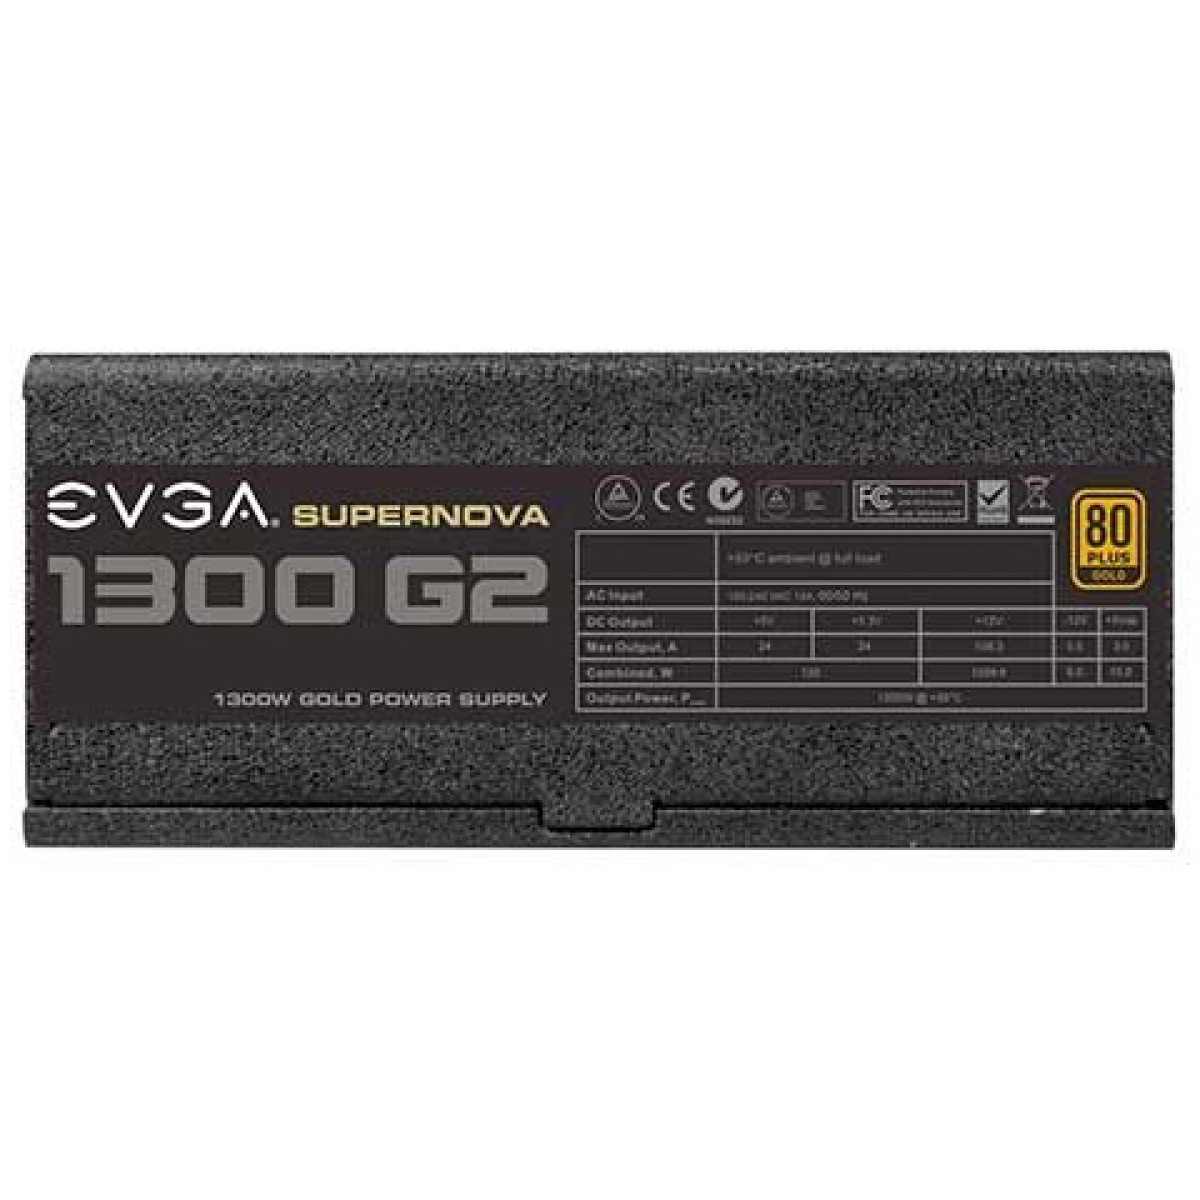 Fonte EVGA SuperNova G2 1300W, 80 Plus Gold, PFC Ativo, Full Modular, 120-g2-1300-x0